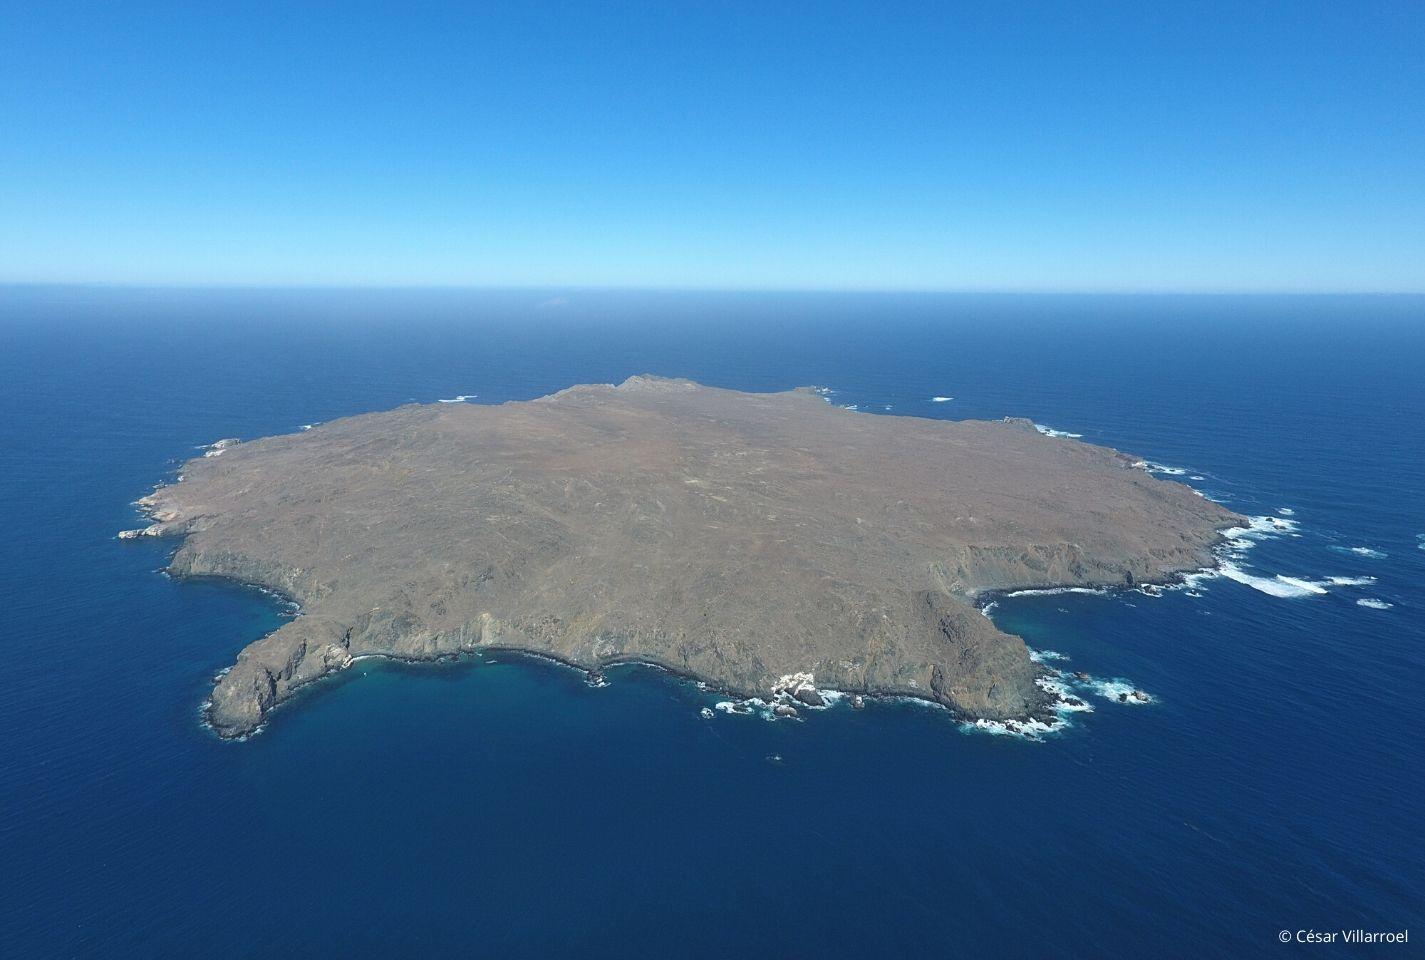 Archipiélago de Humboldt, paraíso en peligro